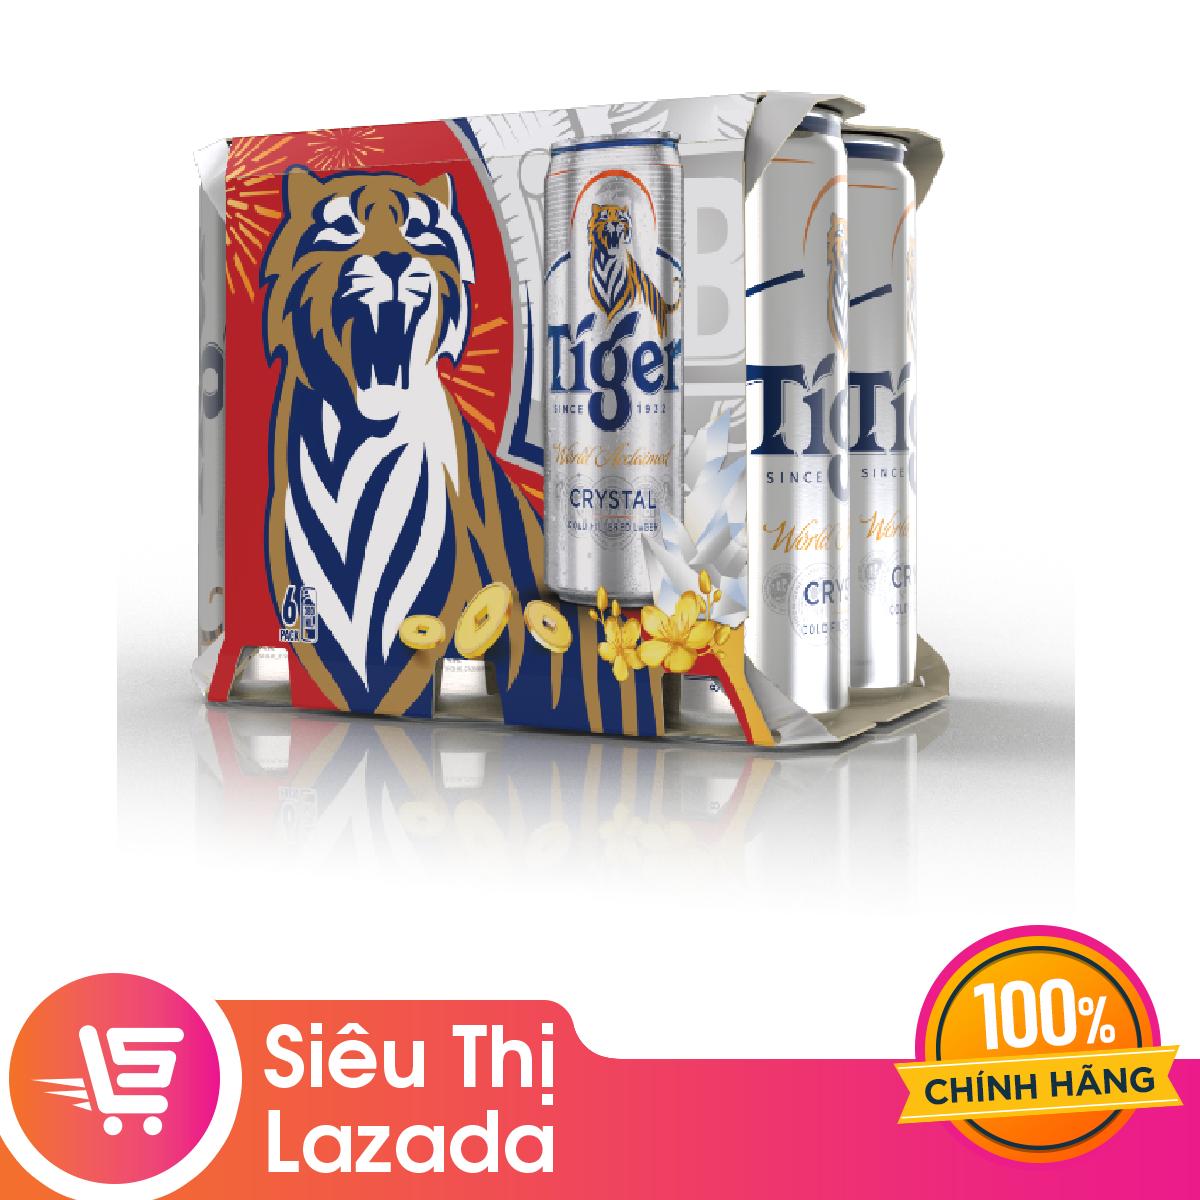 Lốc 6 lon Tiger Crystal lon cao mới (330ml/lon) Bao bì Tết